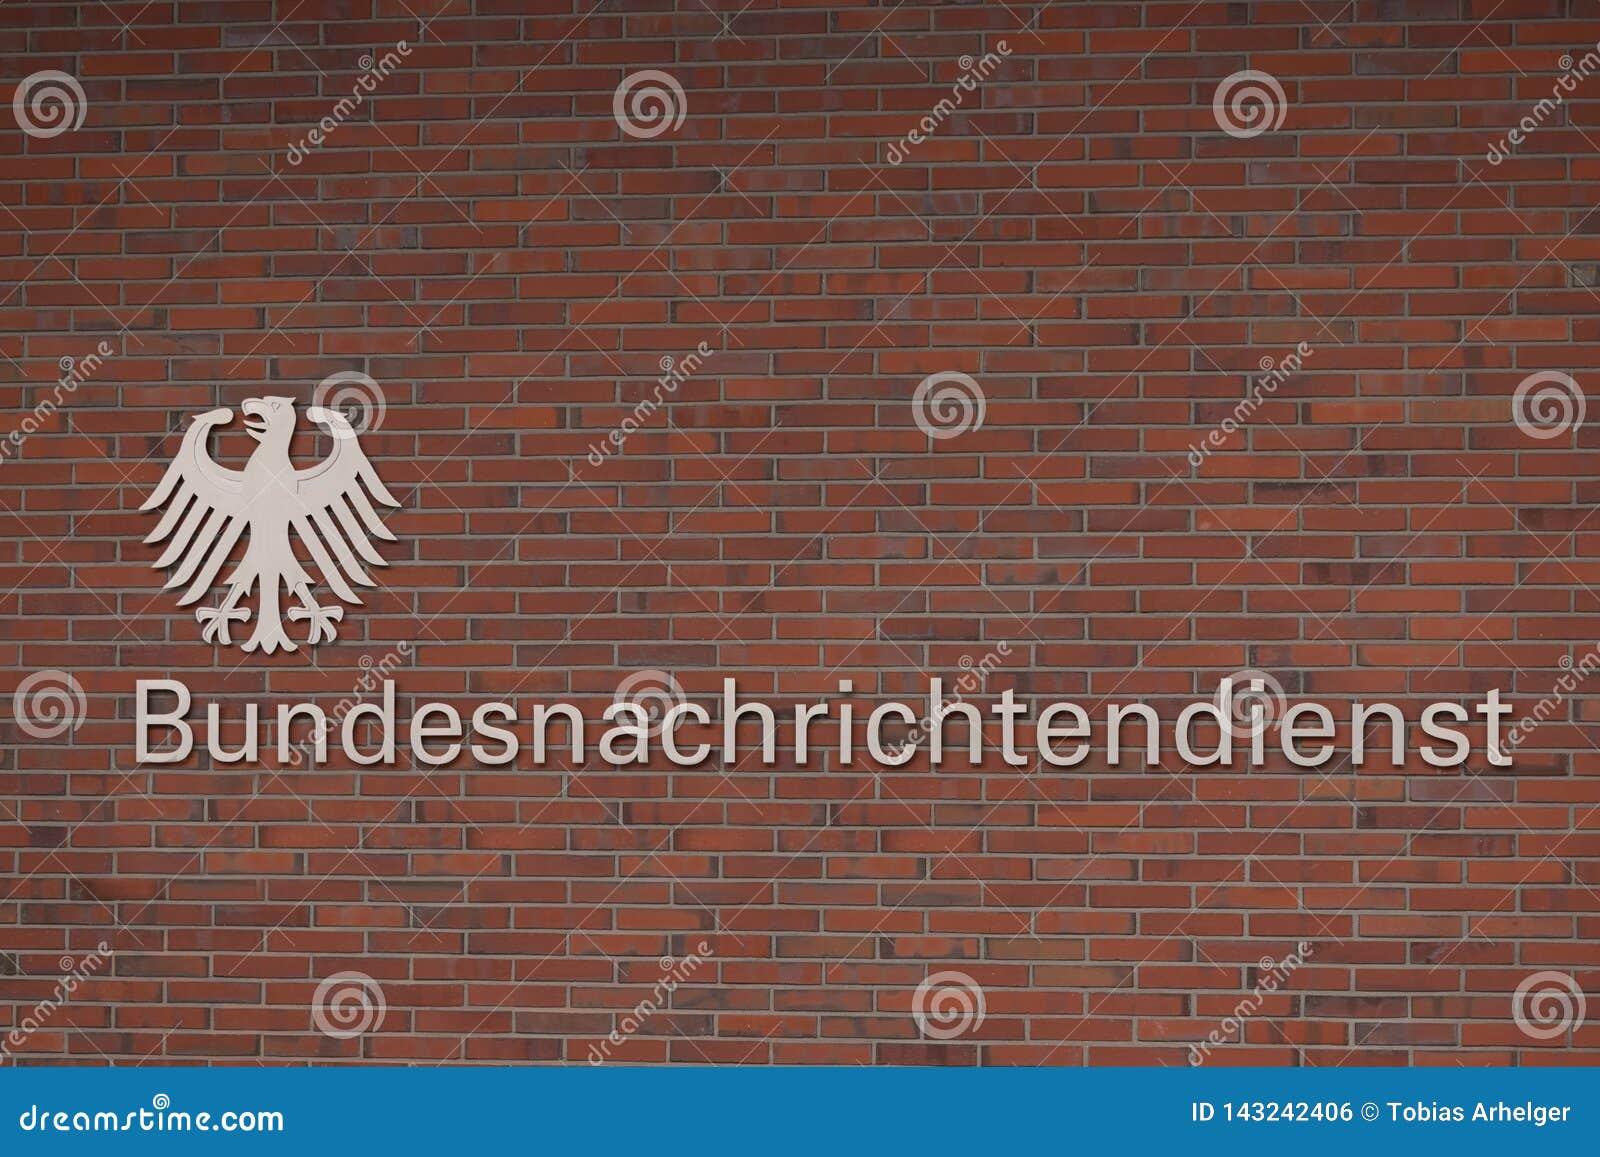 Duitse Federale intelligentie bundesnachrichtendienst in Berlijn Duitsland